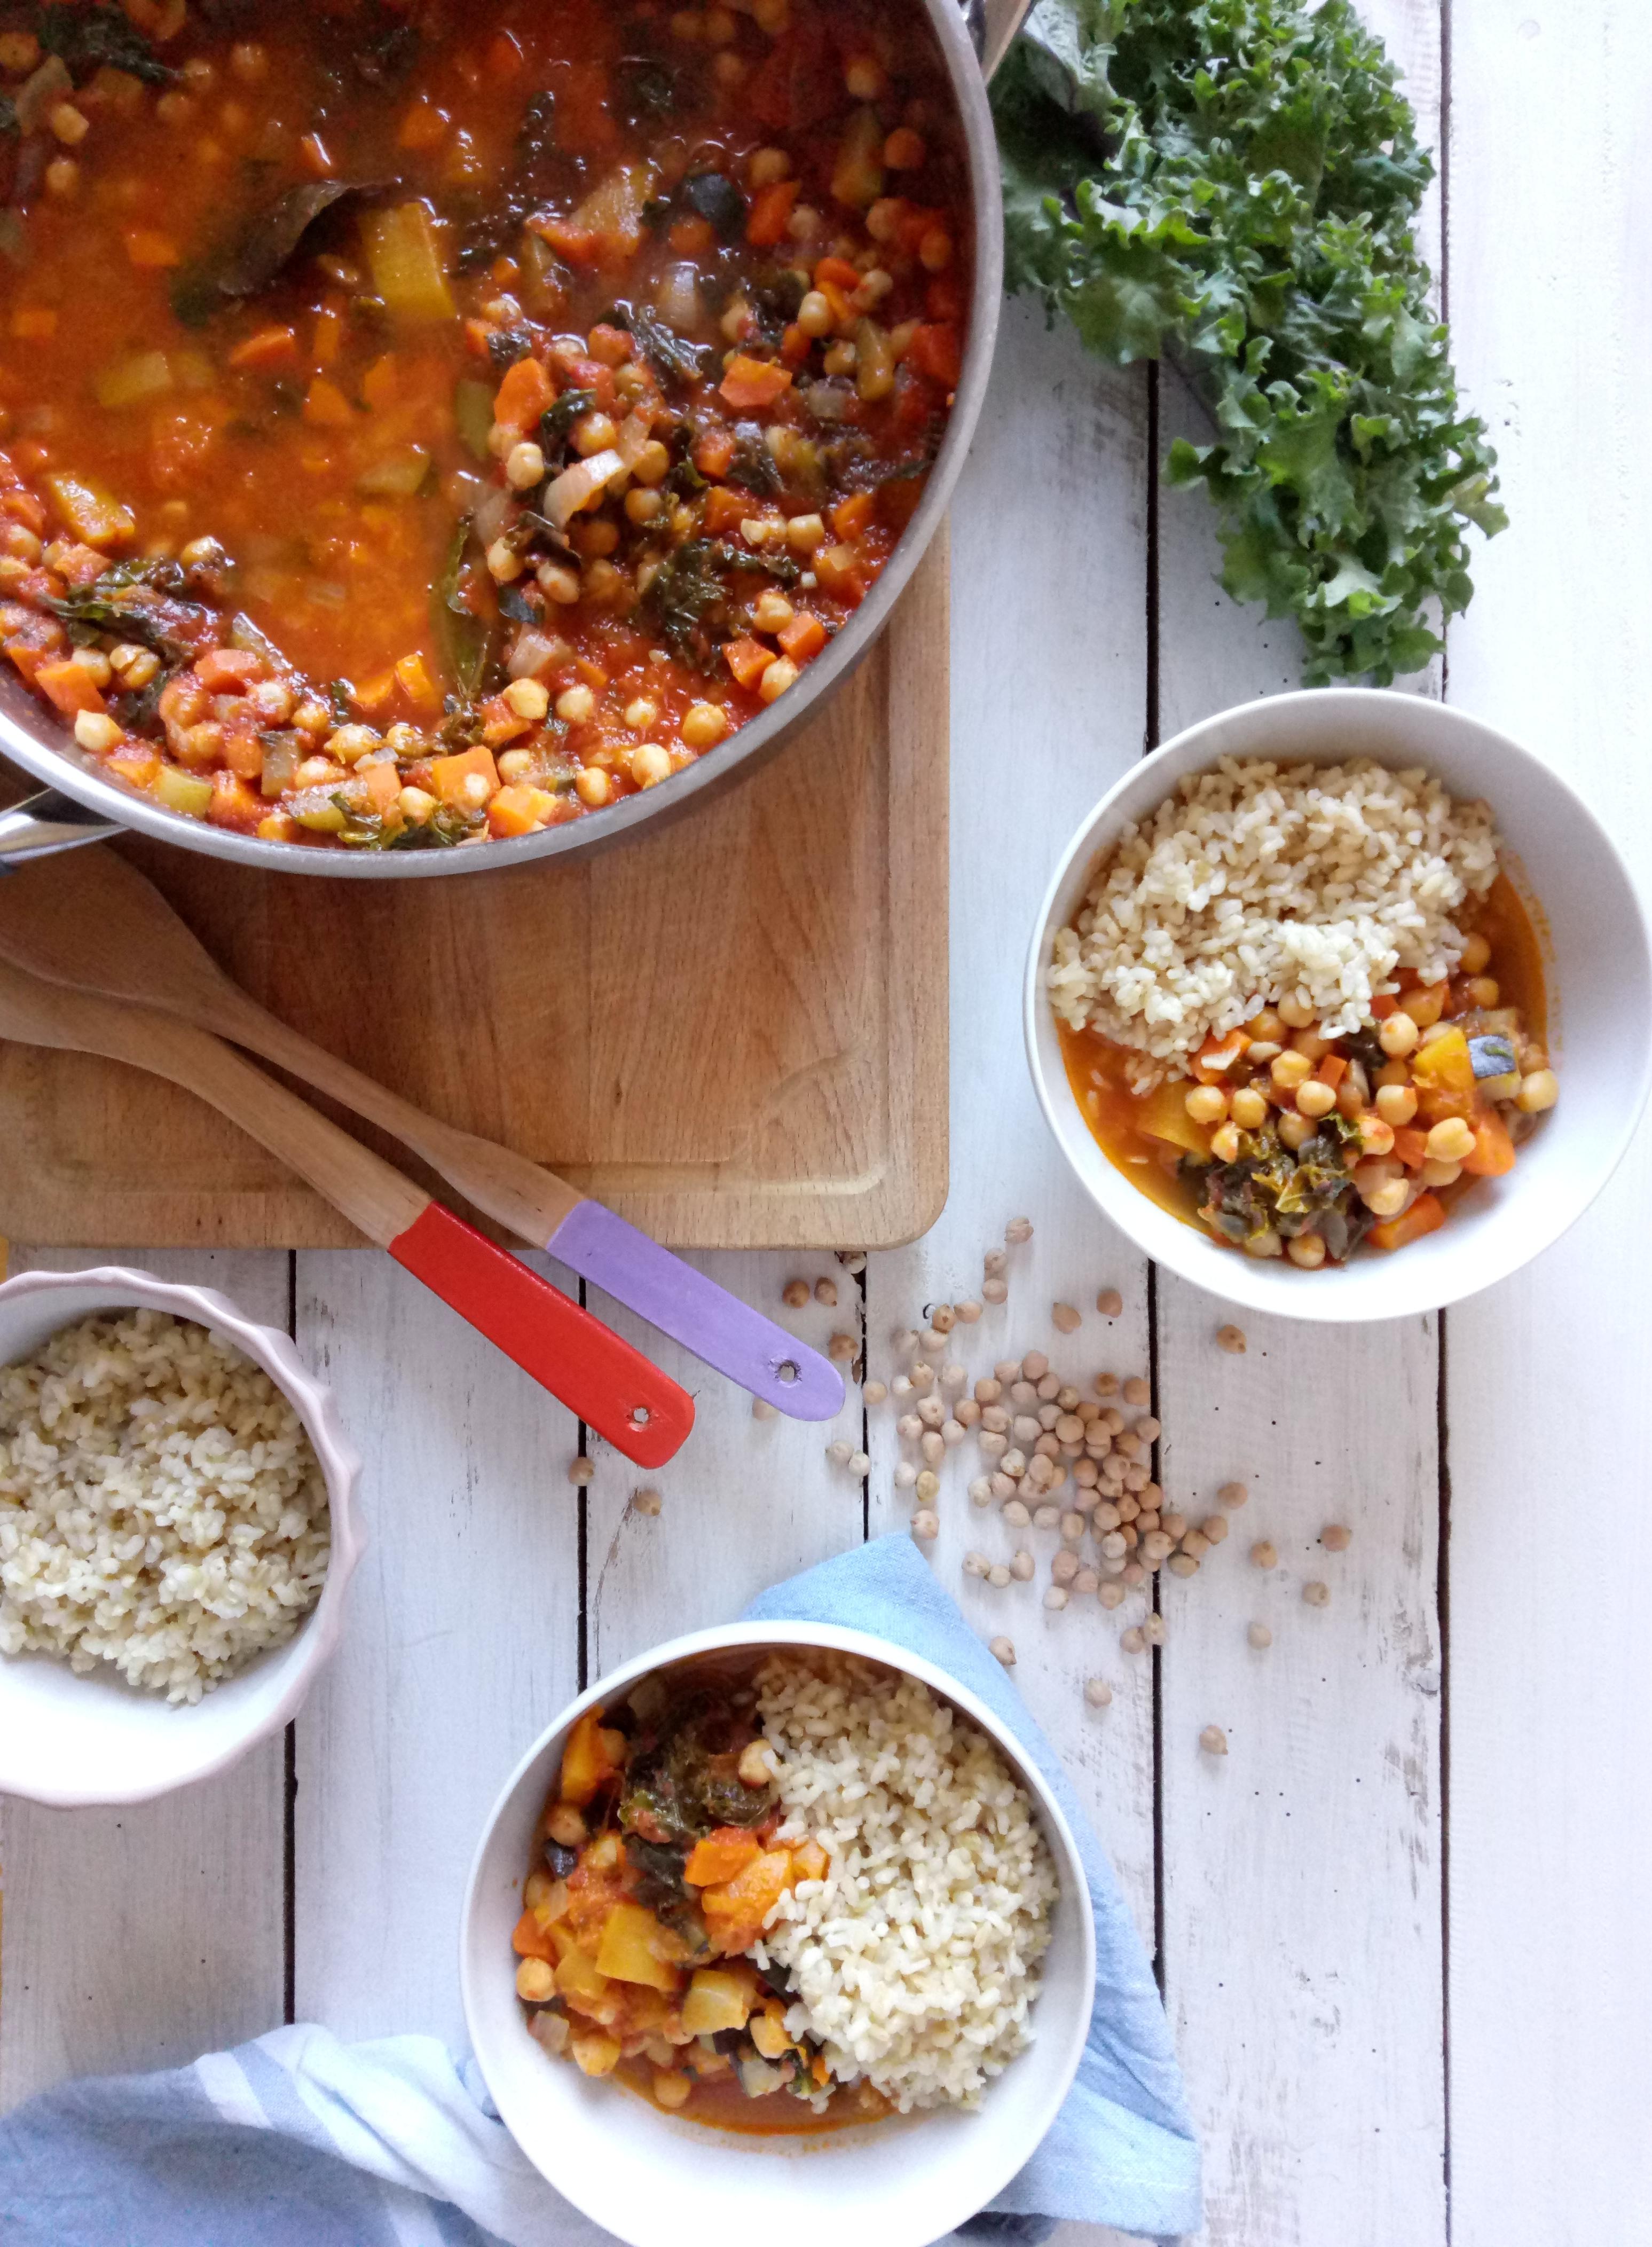 Chickpea and Pumpkin Stew (Vegan)